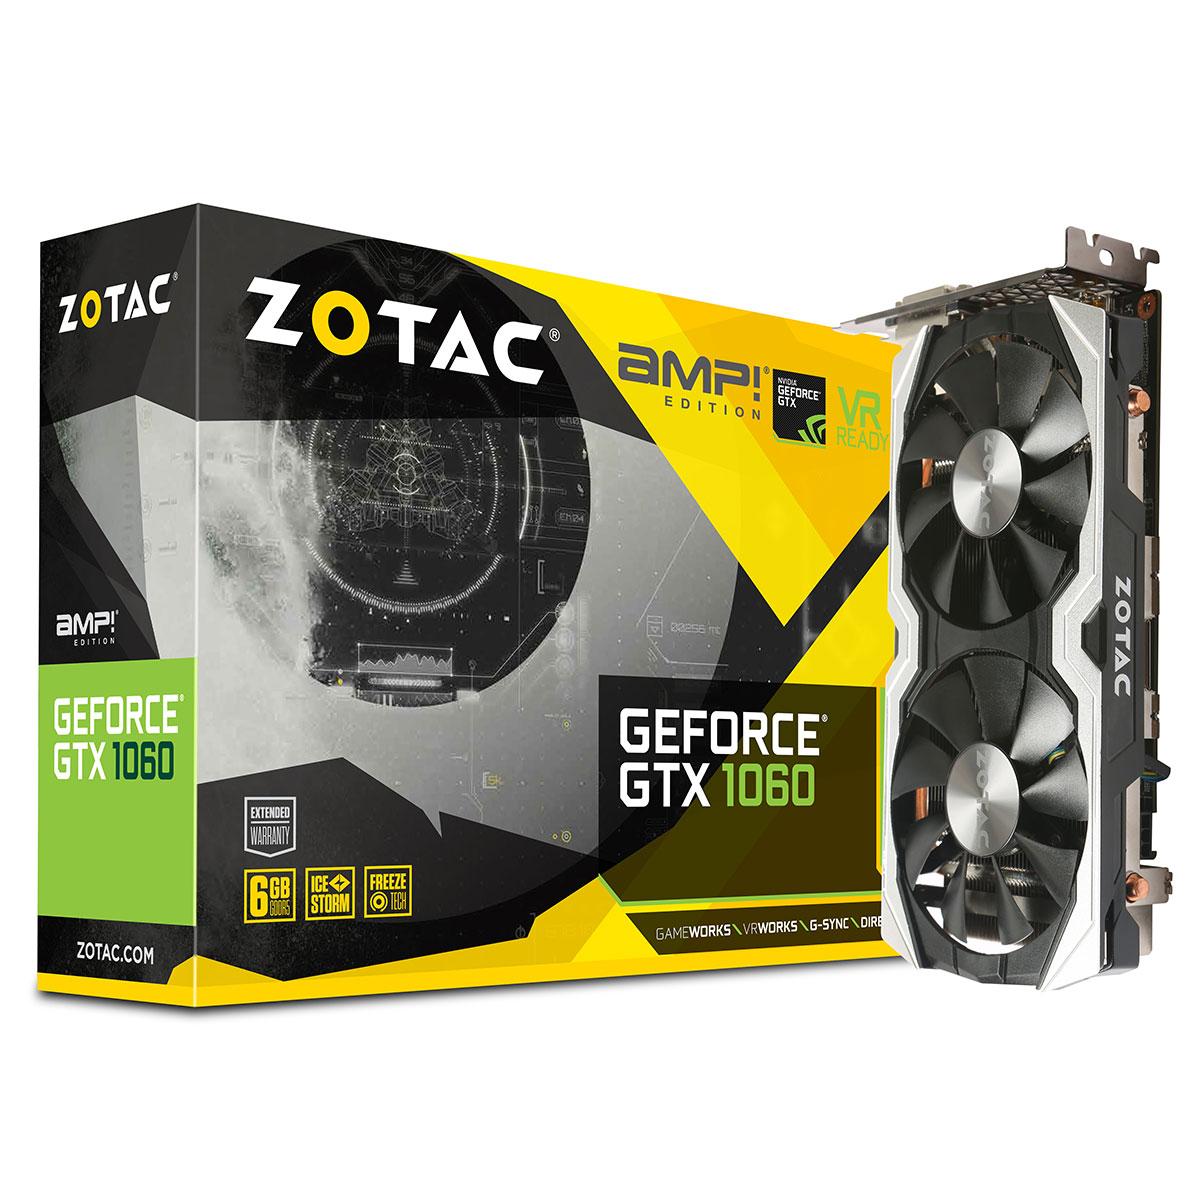 Carte graphique ZOTAC GeForce GTX 1060 AMP! Edition 6144 Mo DVI/HDMI/Tri DisplayPort - PCI Express (NVIDIA GeForce avec CUDA GTX 1060)